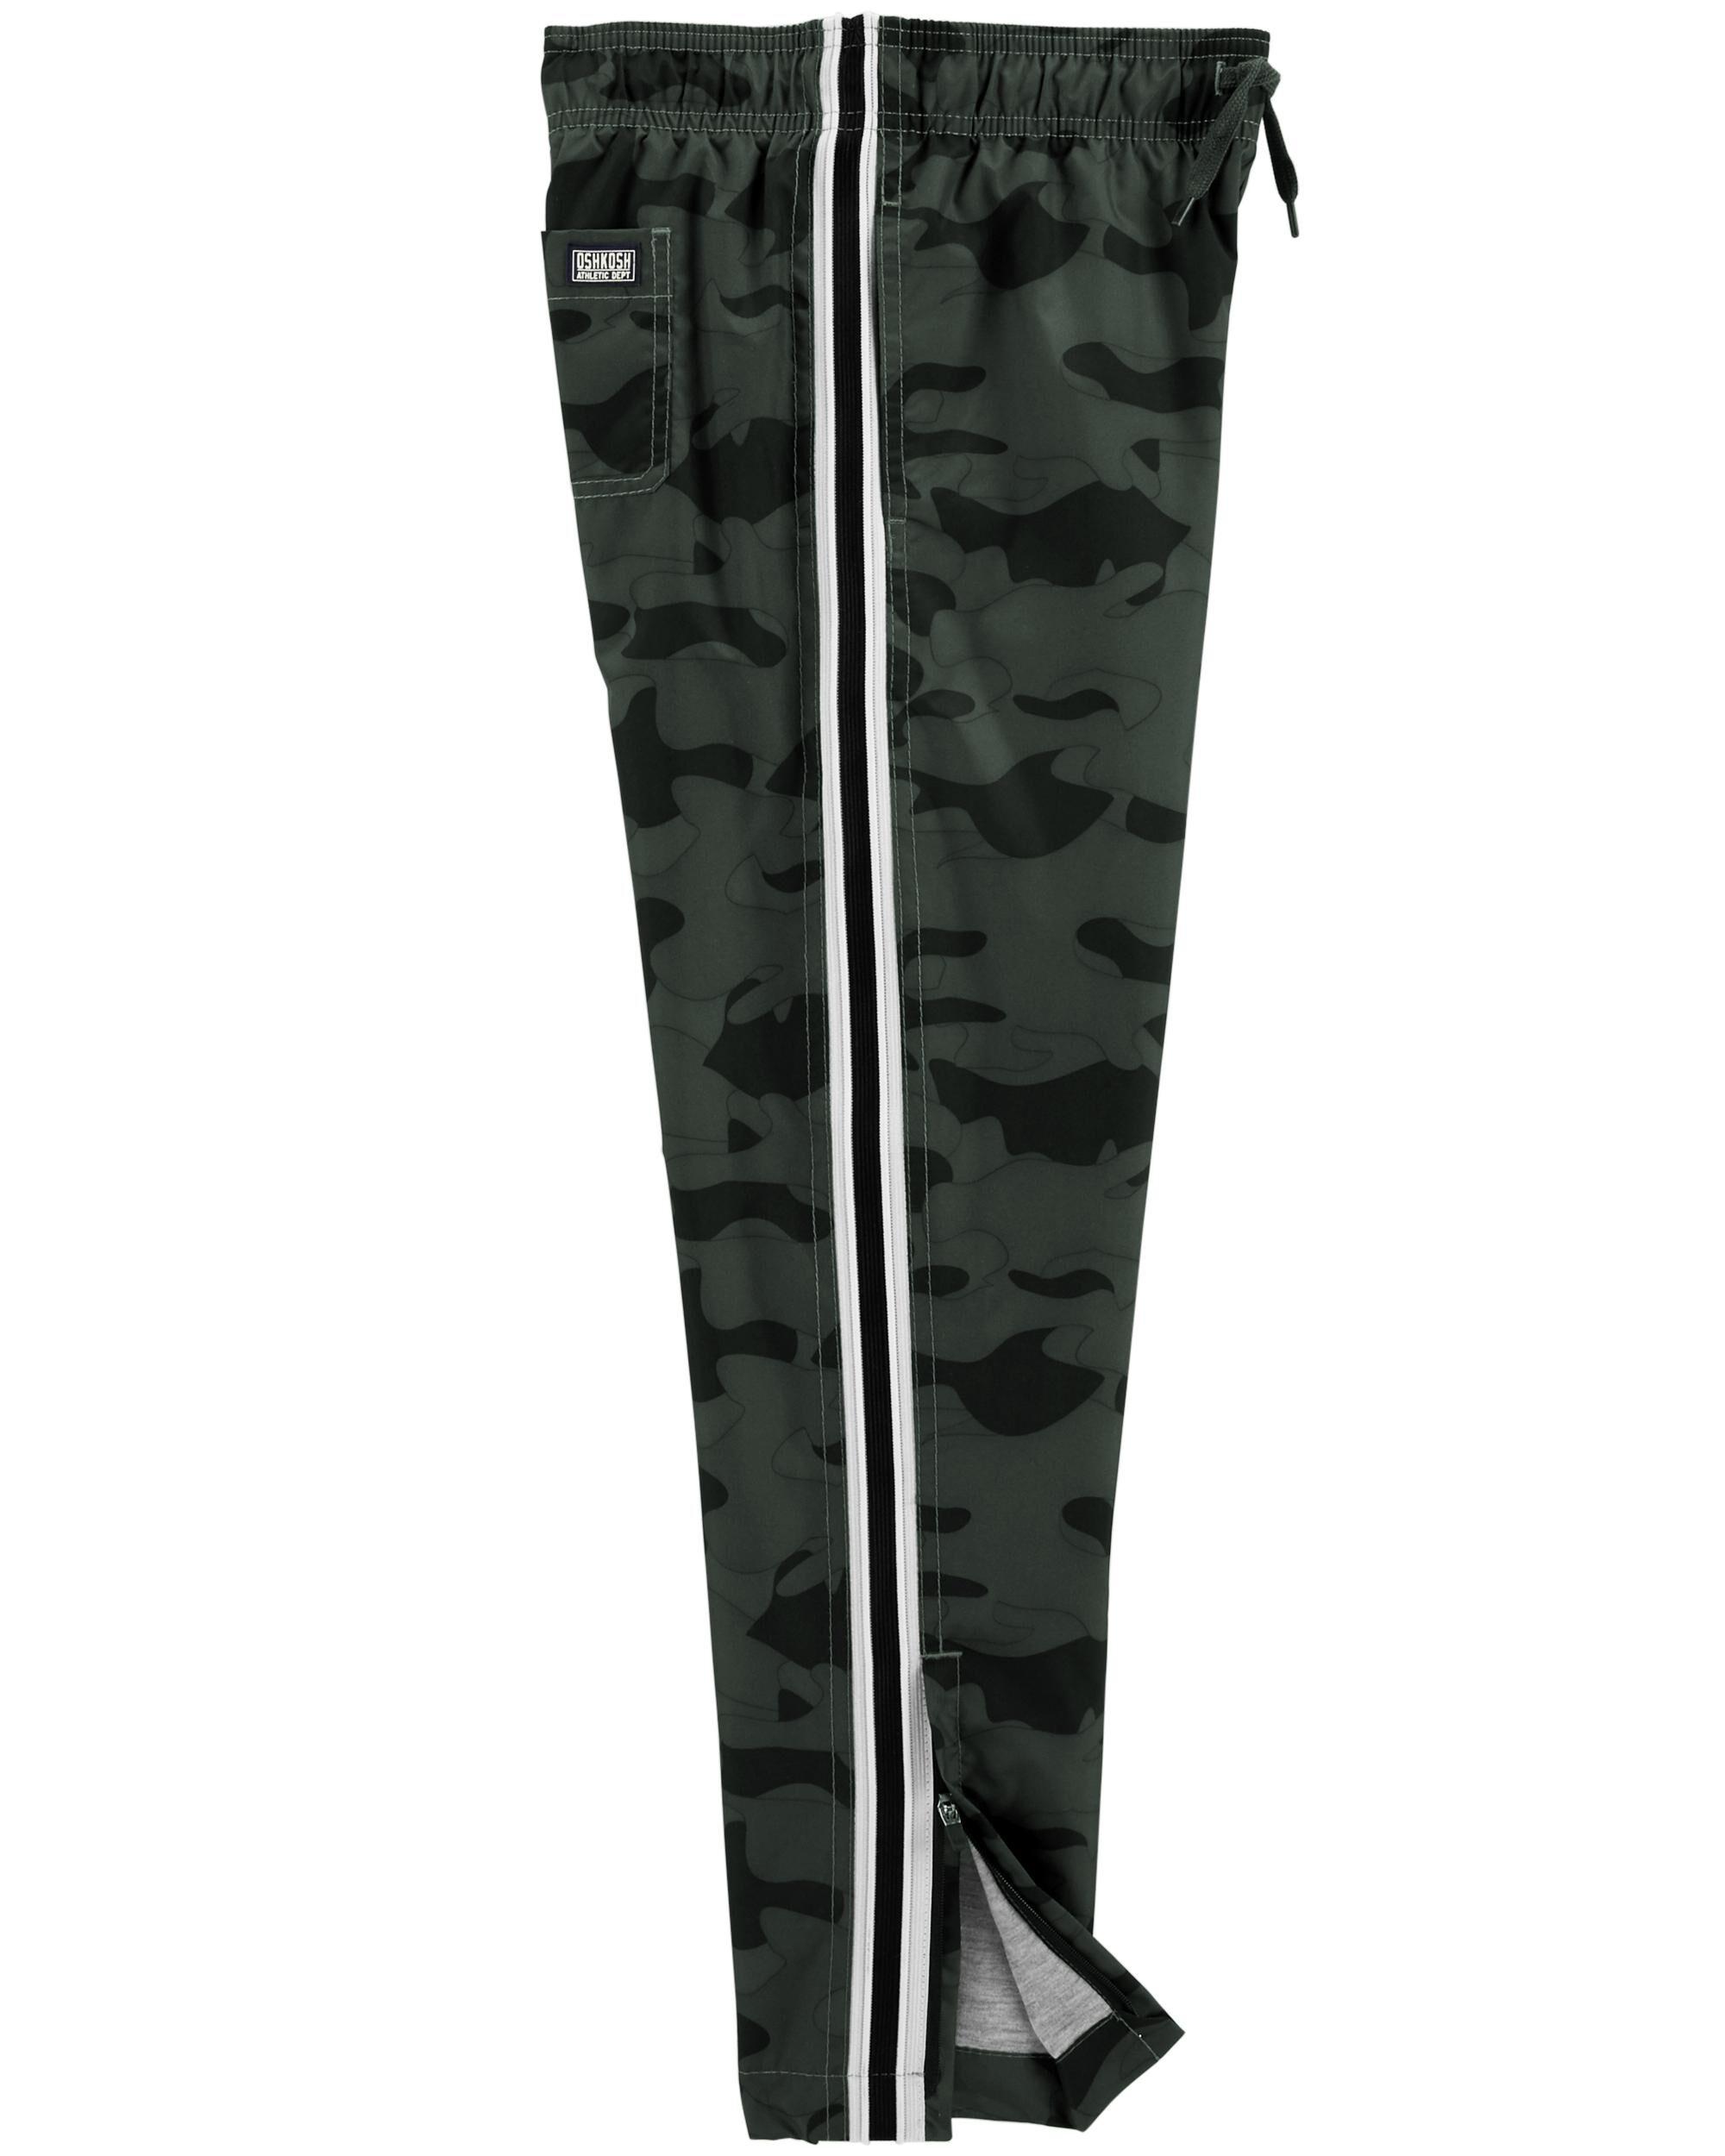 ff81760e6 Active Camo Pants · Active Camo Pants · Active Camo Pants